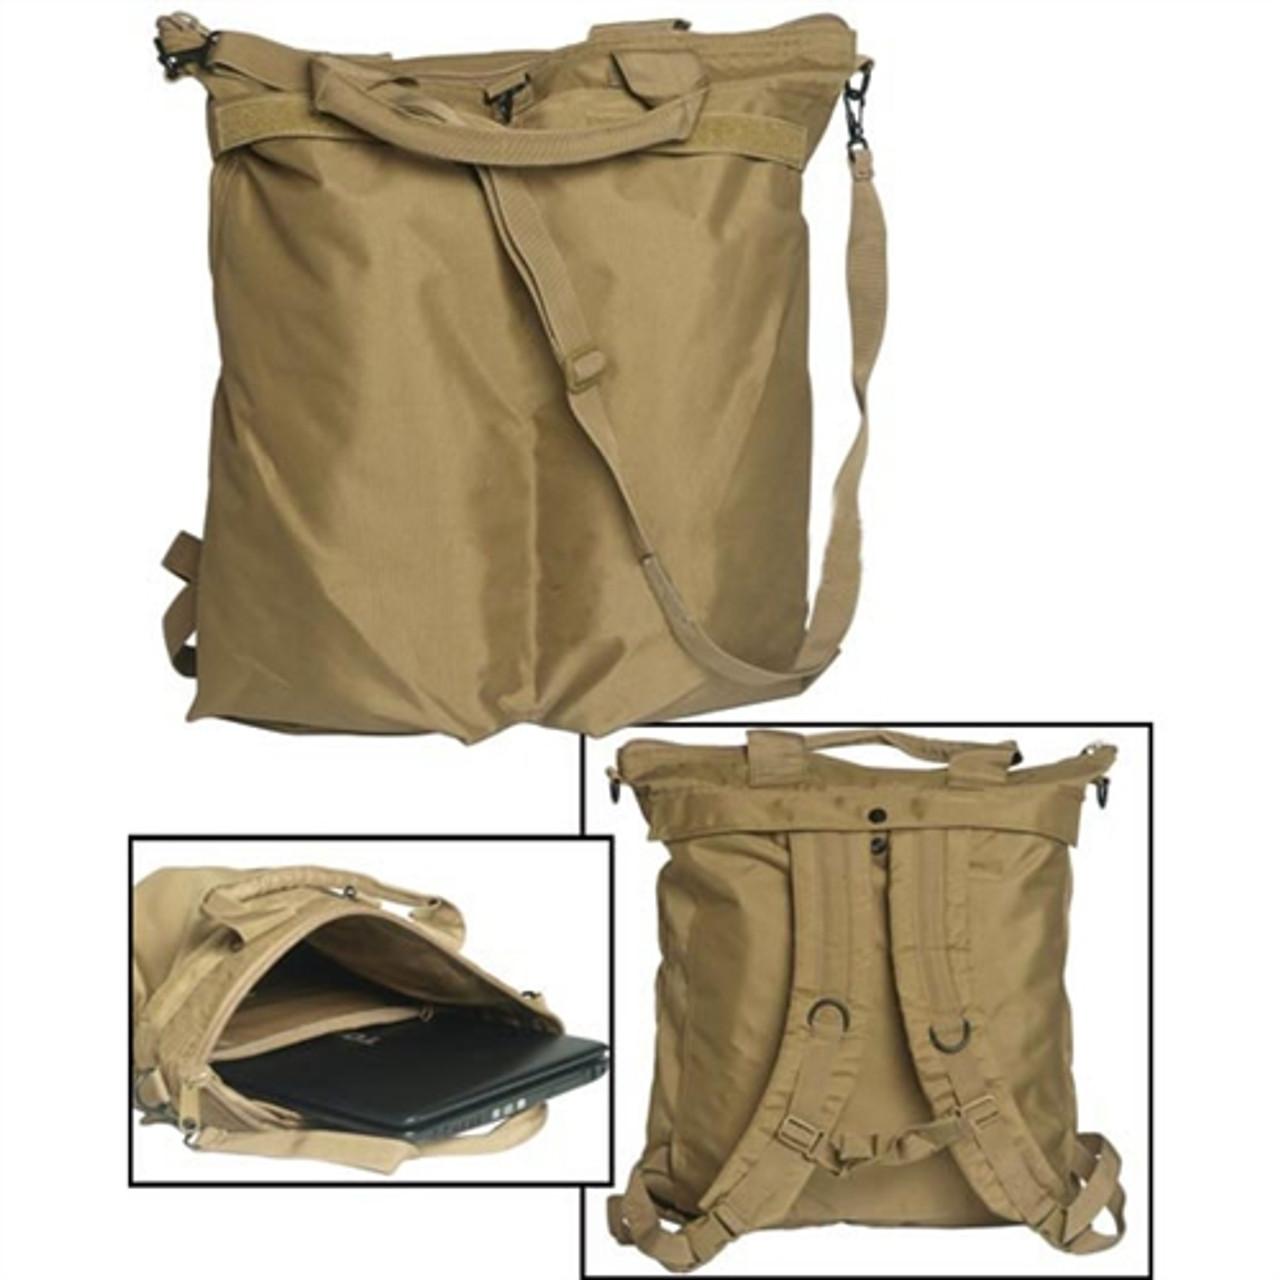 Improved Flyers Helmet Bag - Coyote from Hessen Antique Militaria